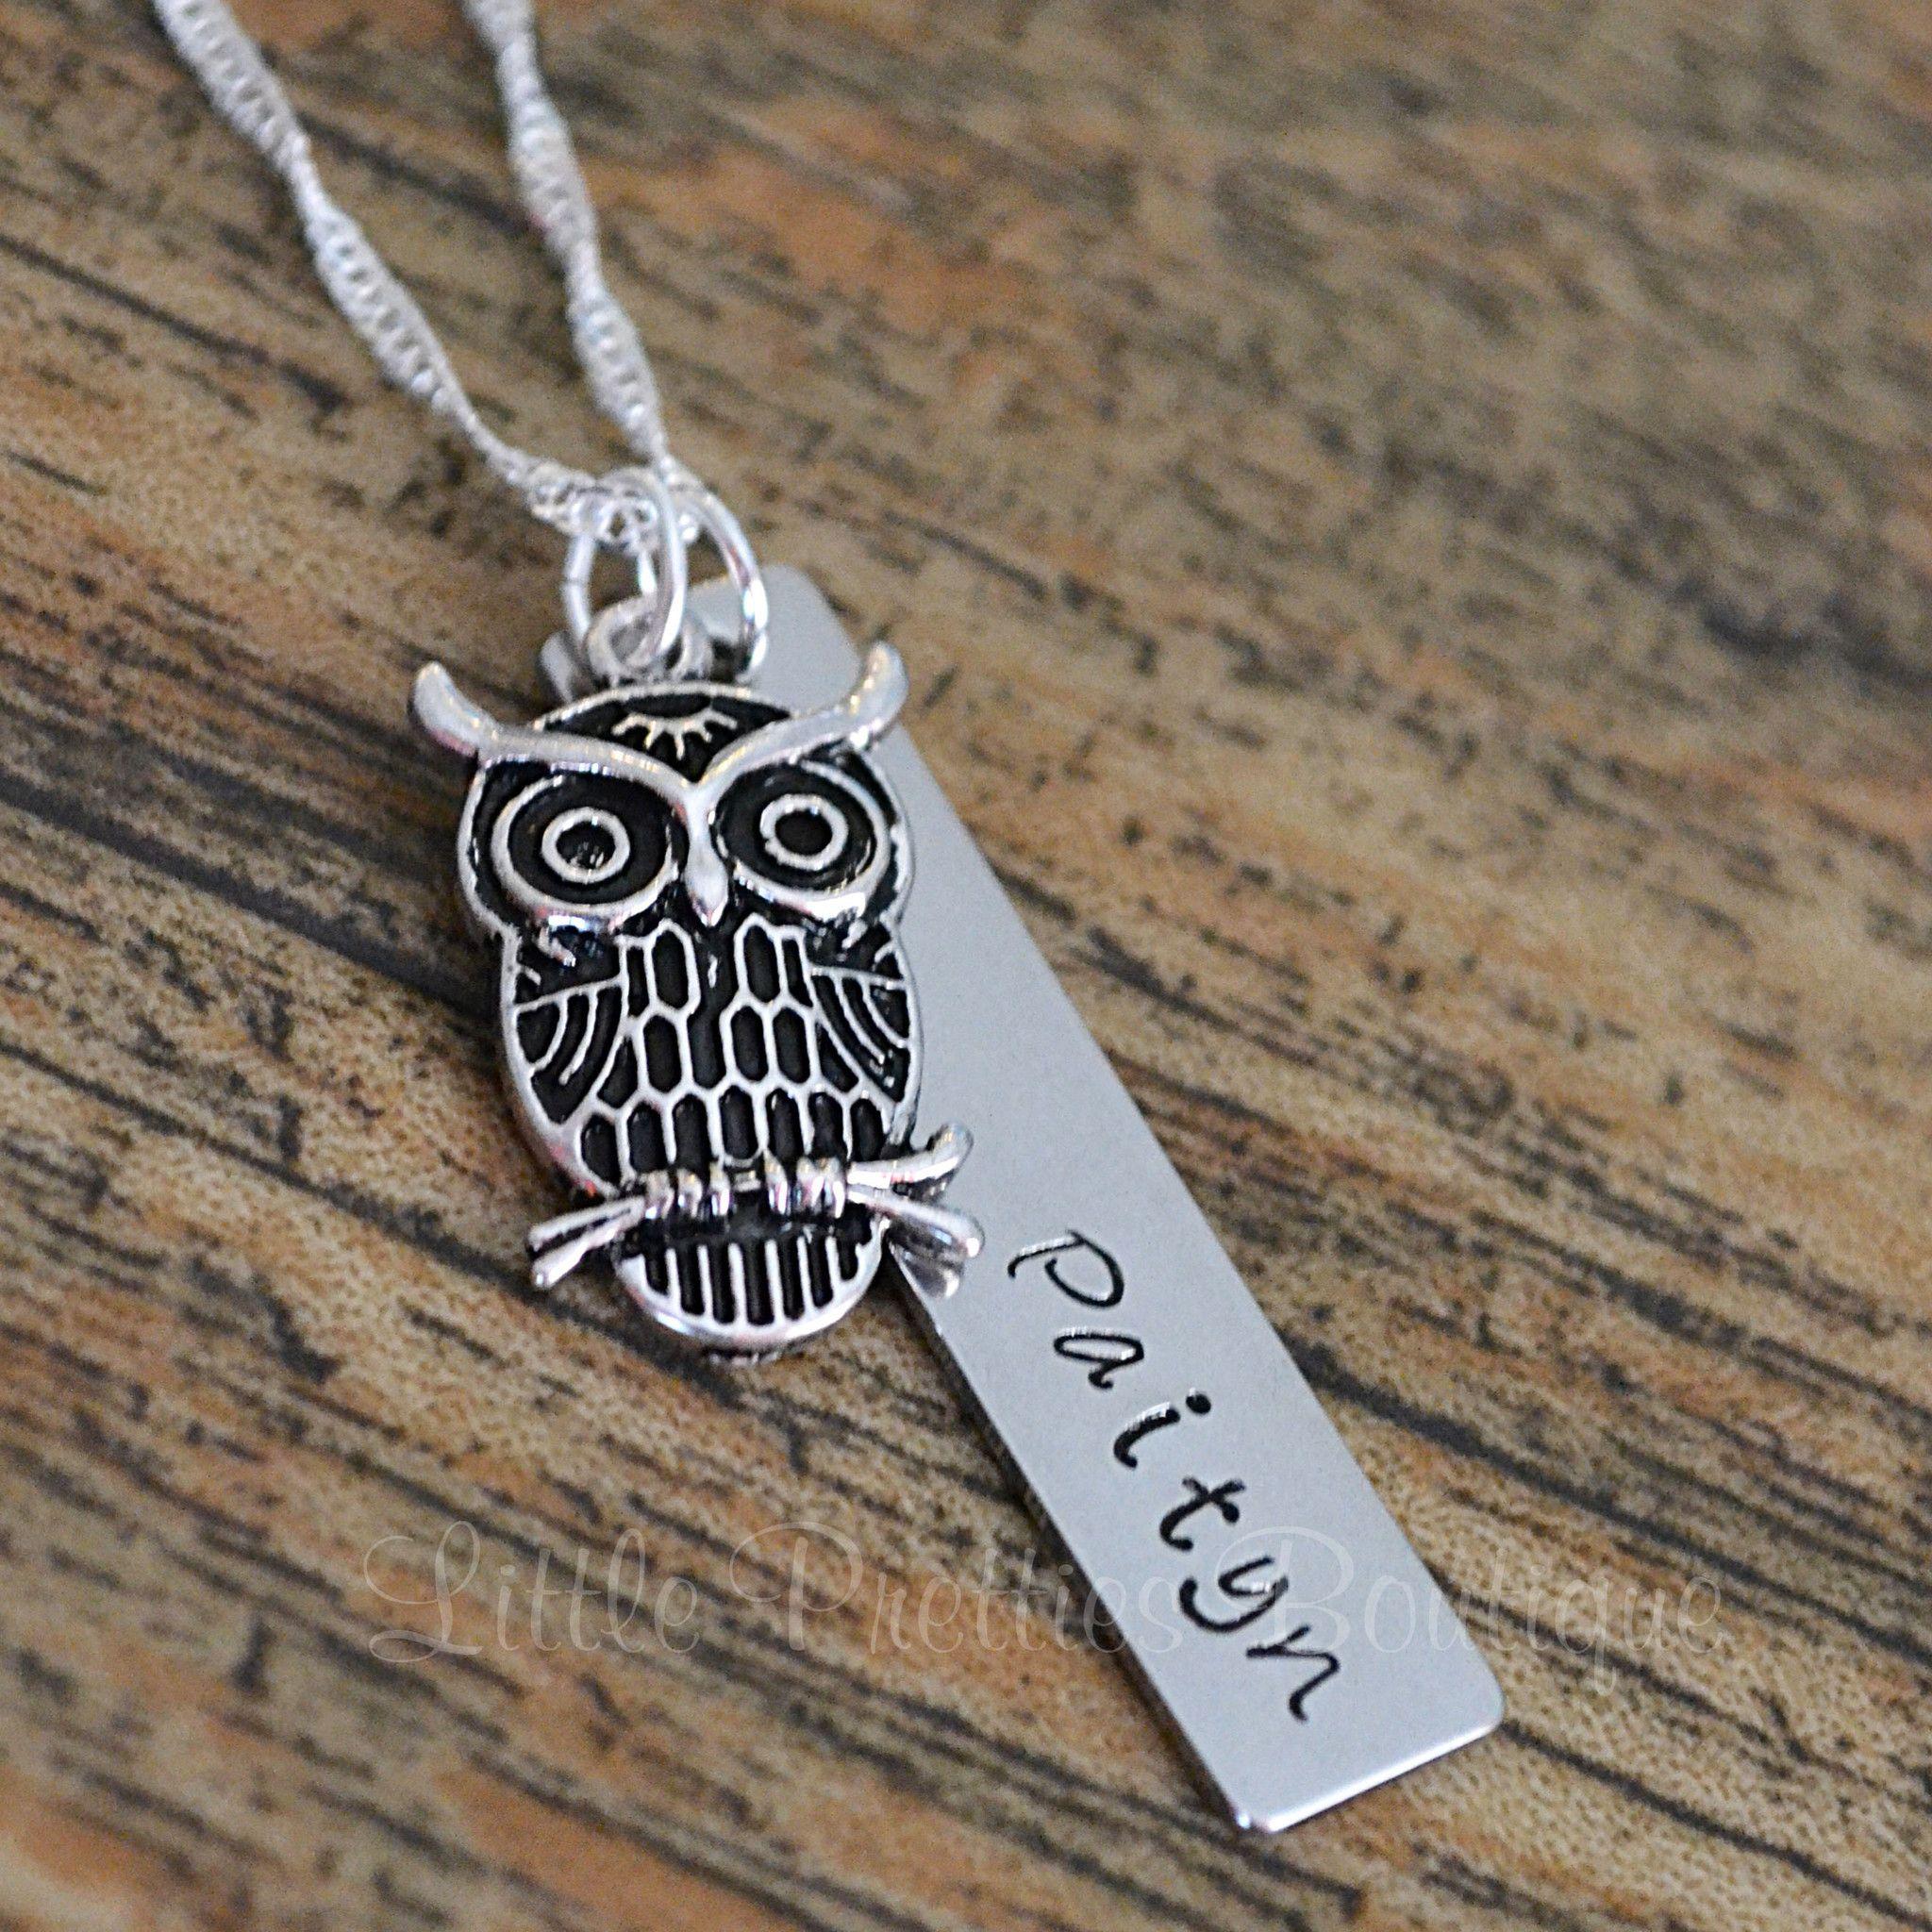 Owl Nameplate Necklace www.littleprettiesboutique.com